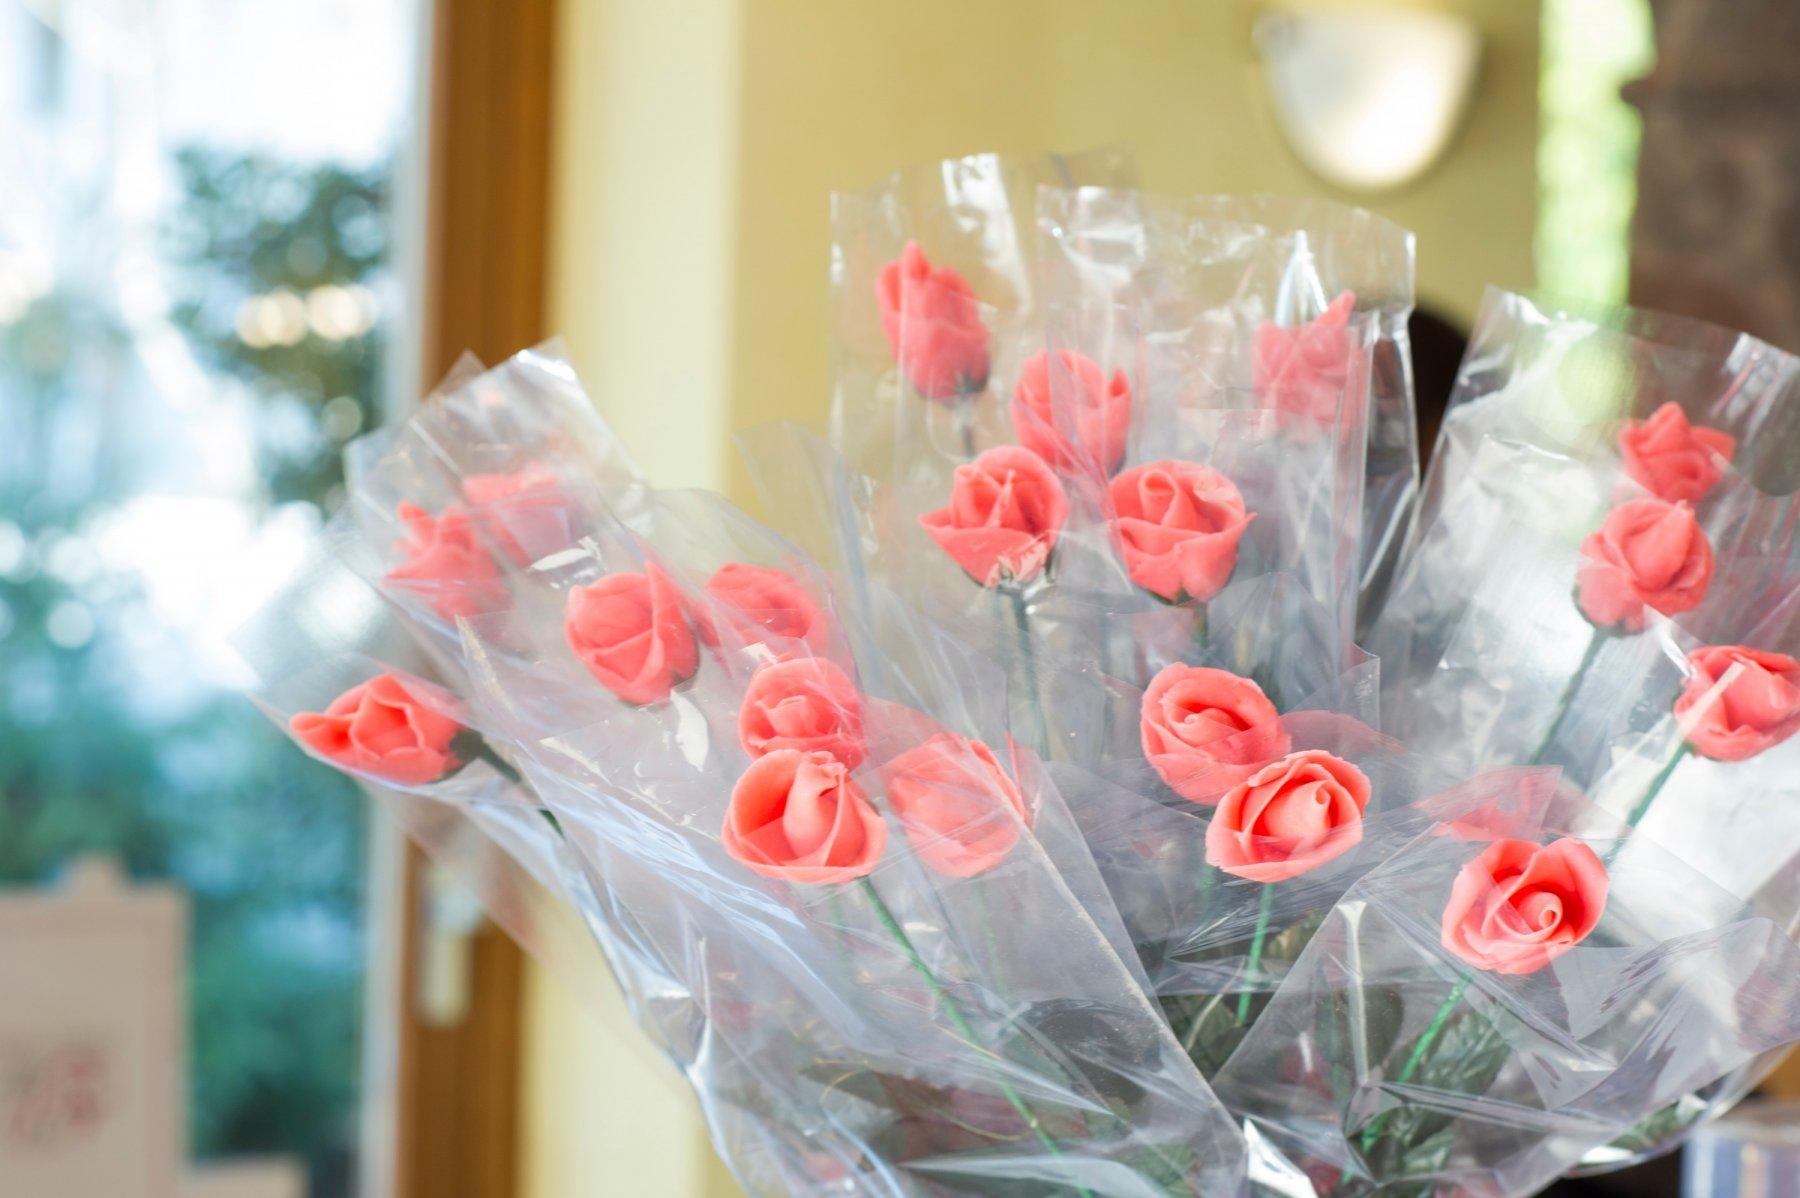 Therme meran valentinstag